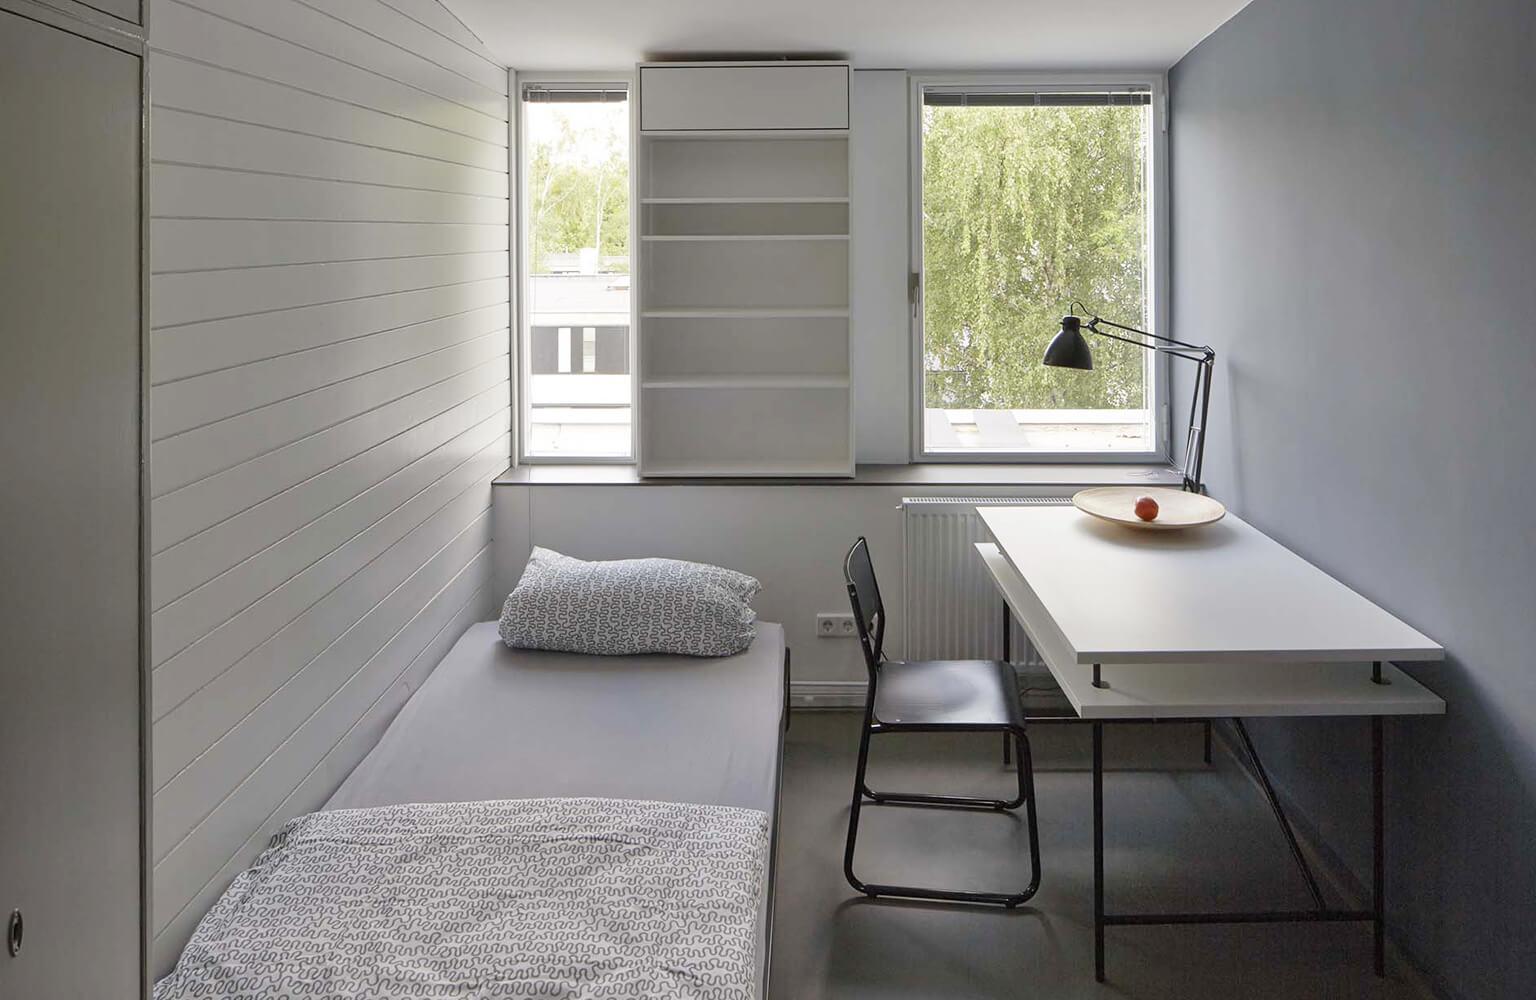 loft in berlin kaufen berlin berlin kaufen loft zimmer with loft in berlin kaufen finest. Black Bedroom Furniture Sets. Home Design Ideas